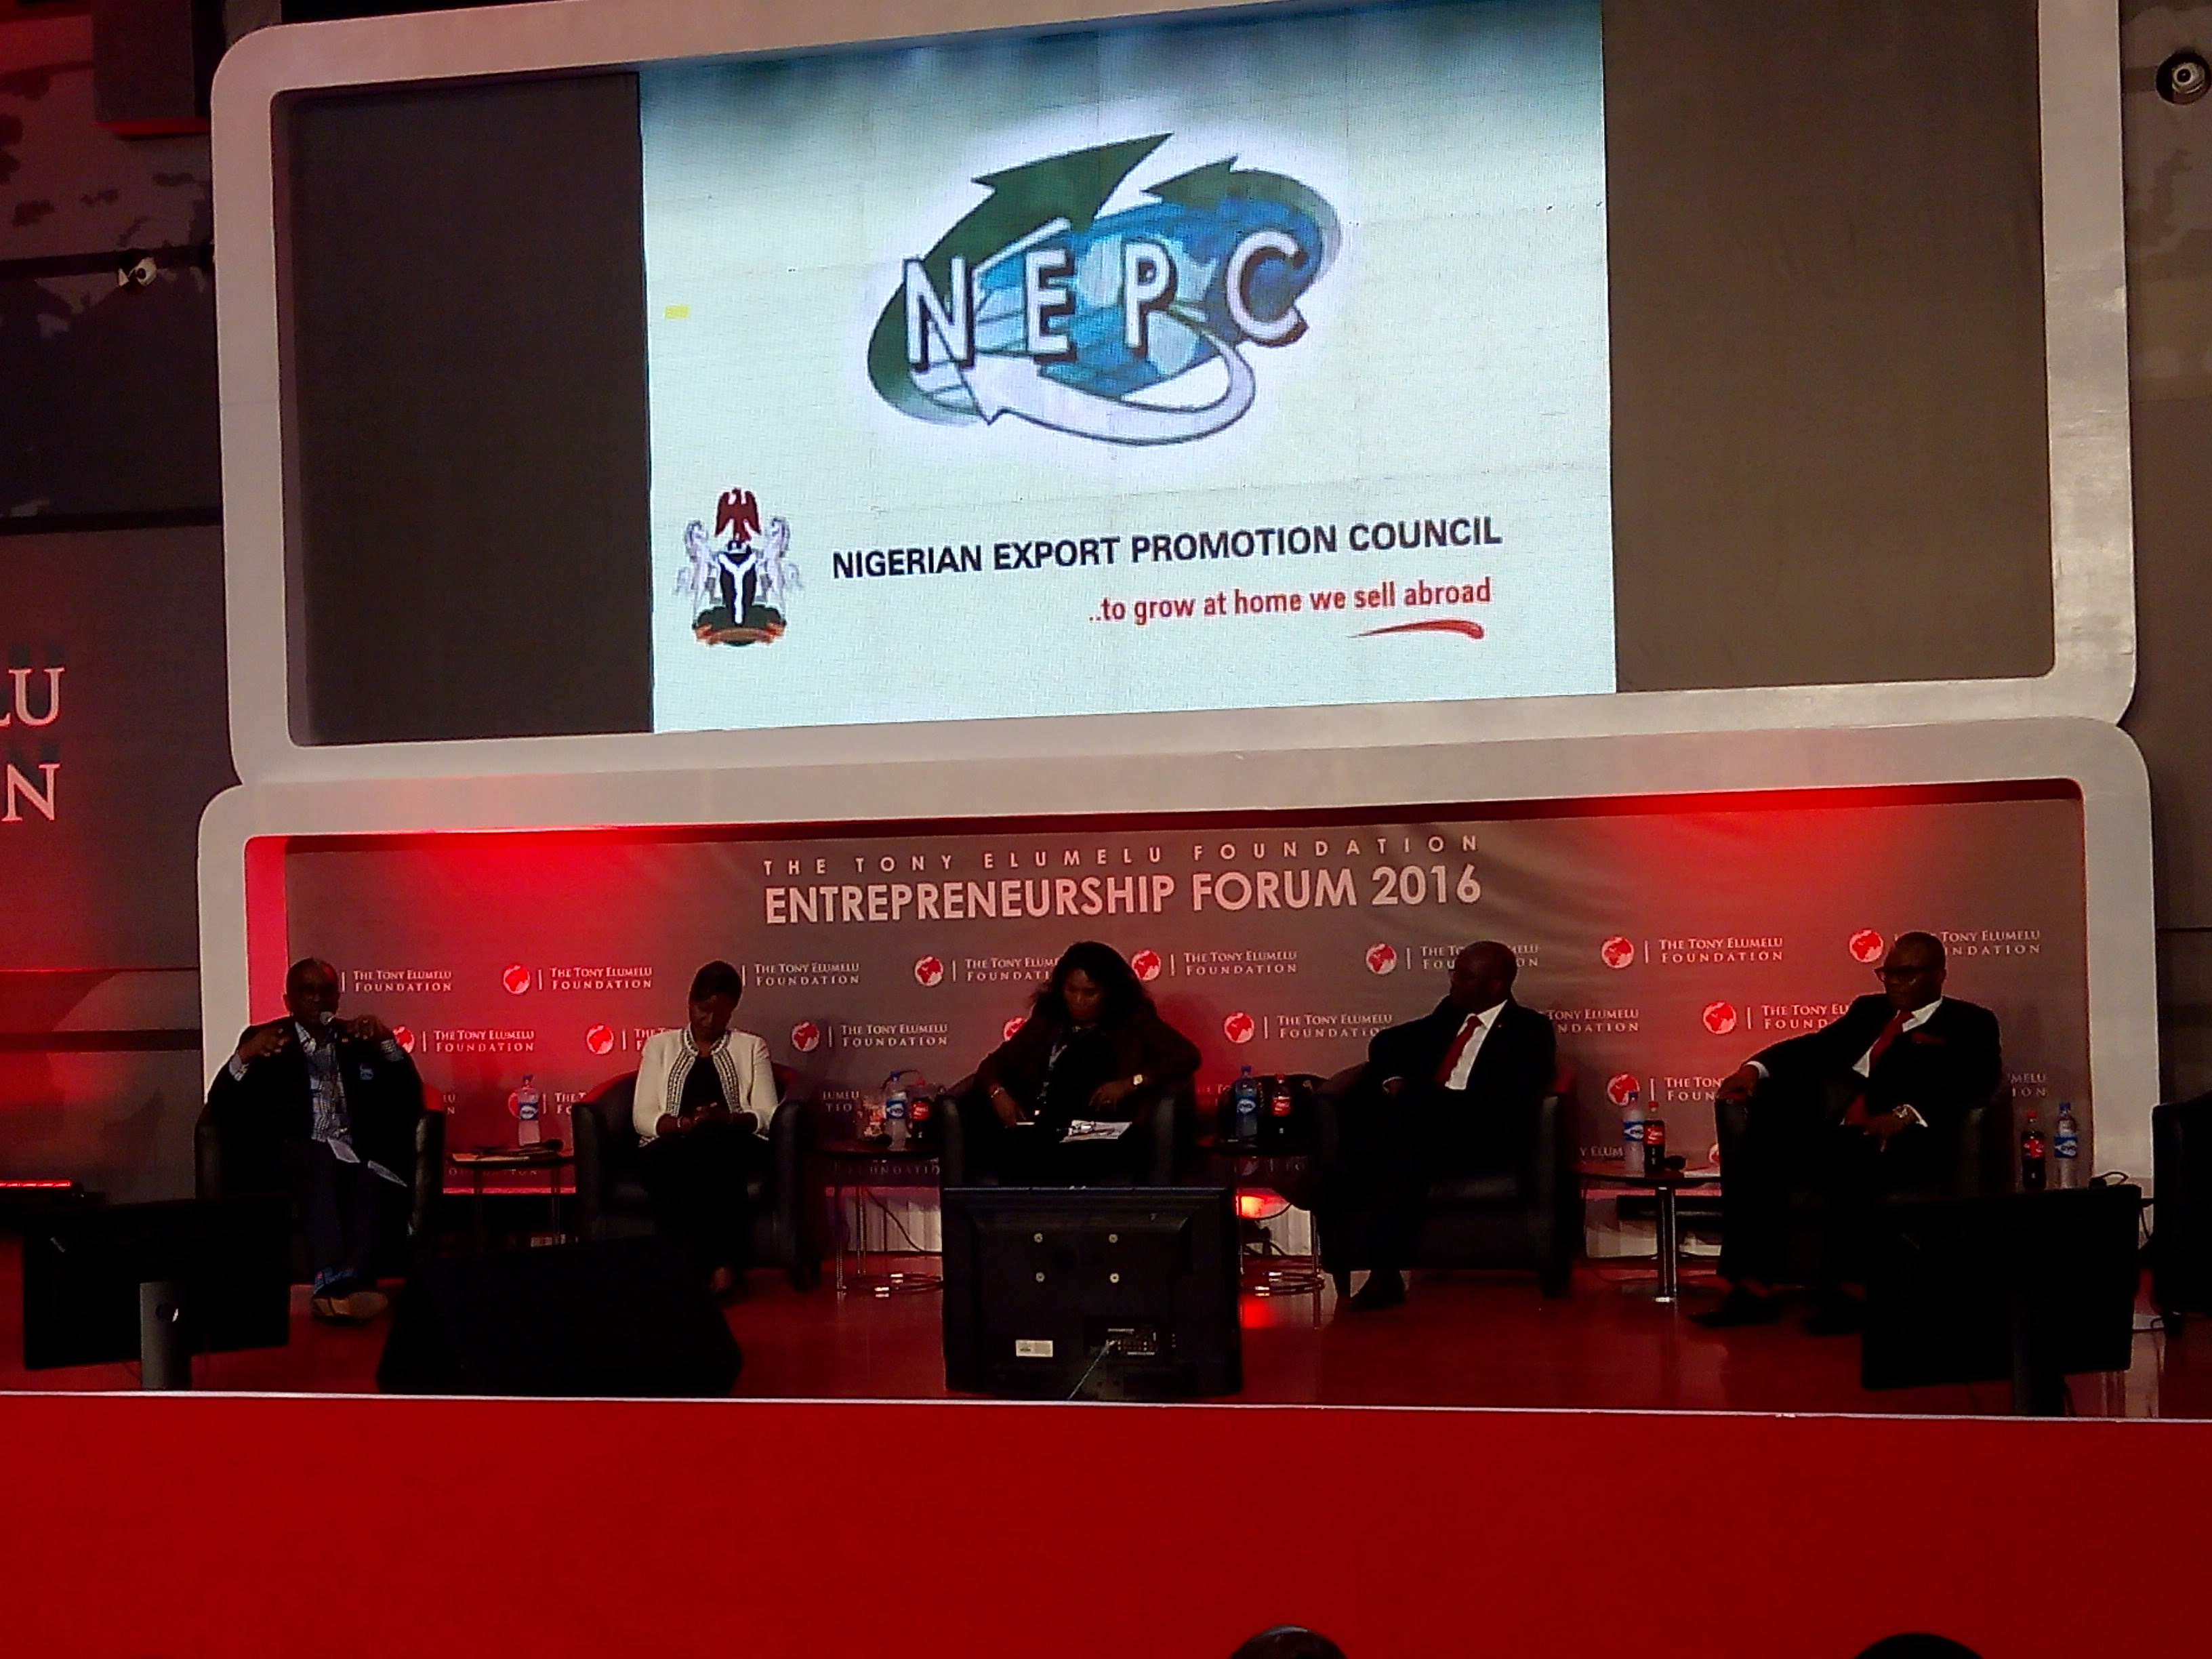 13-tony-elumelu-entrepreneurship-forum-2016